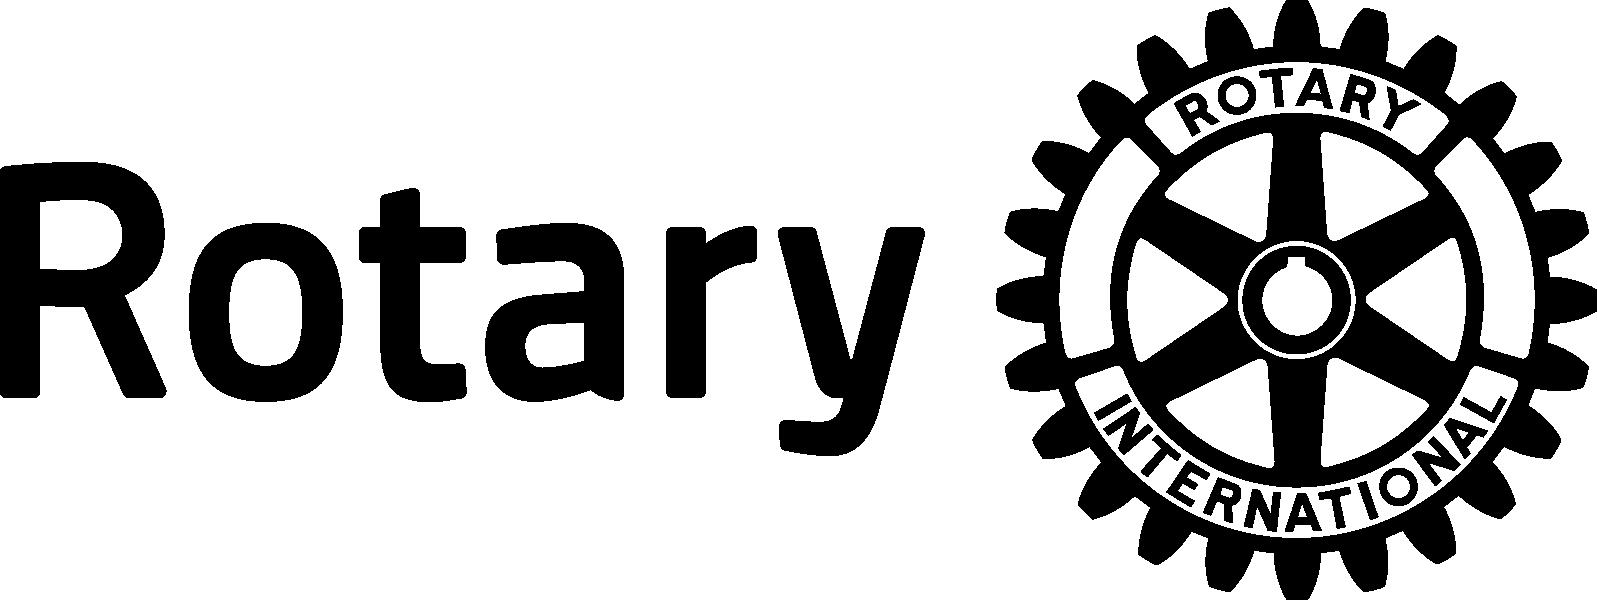 Rotary Masterbrand - Black